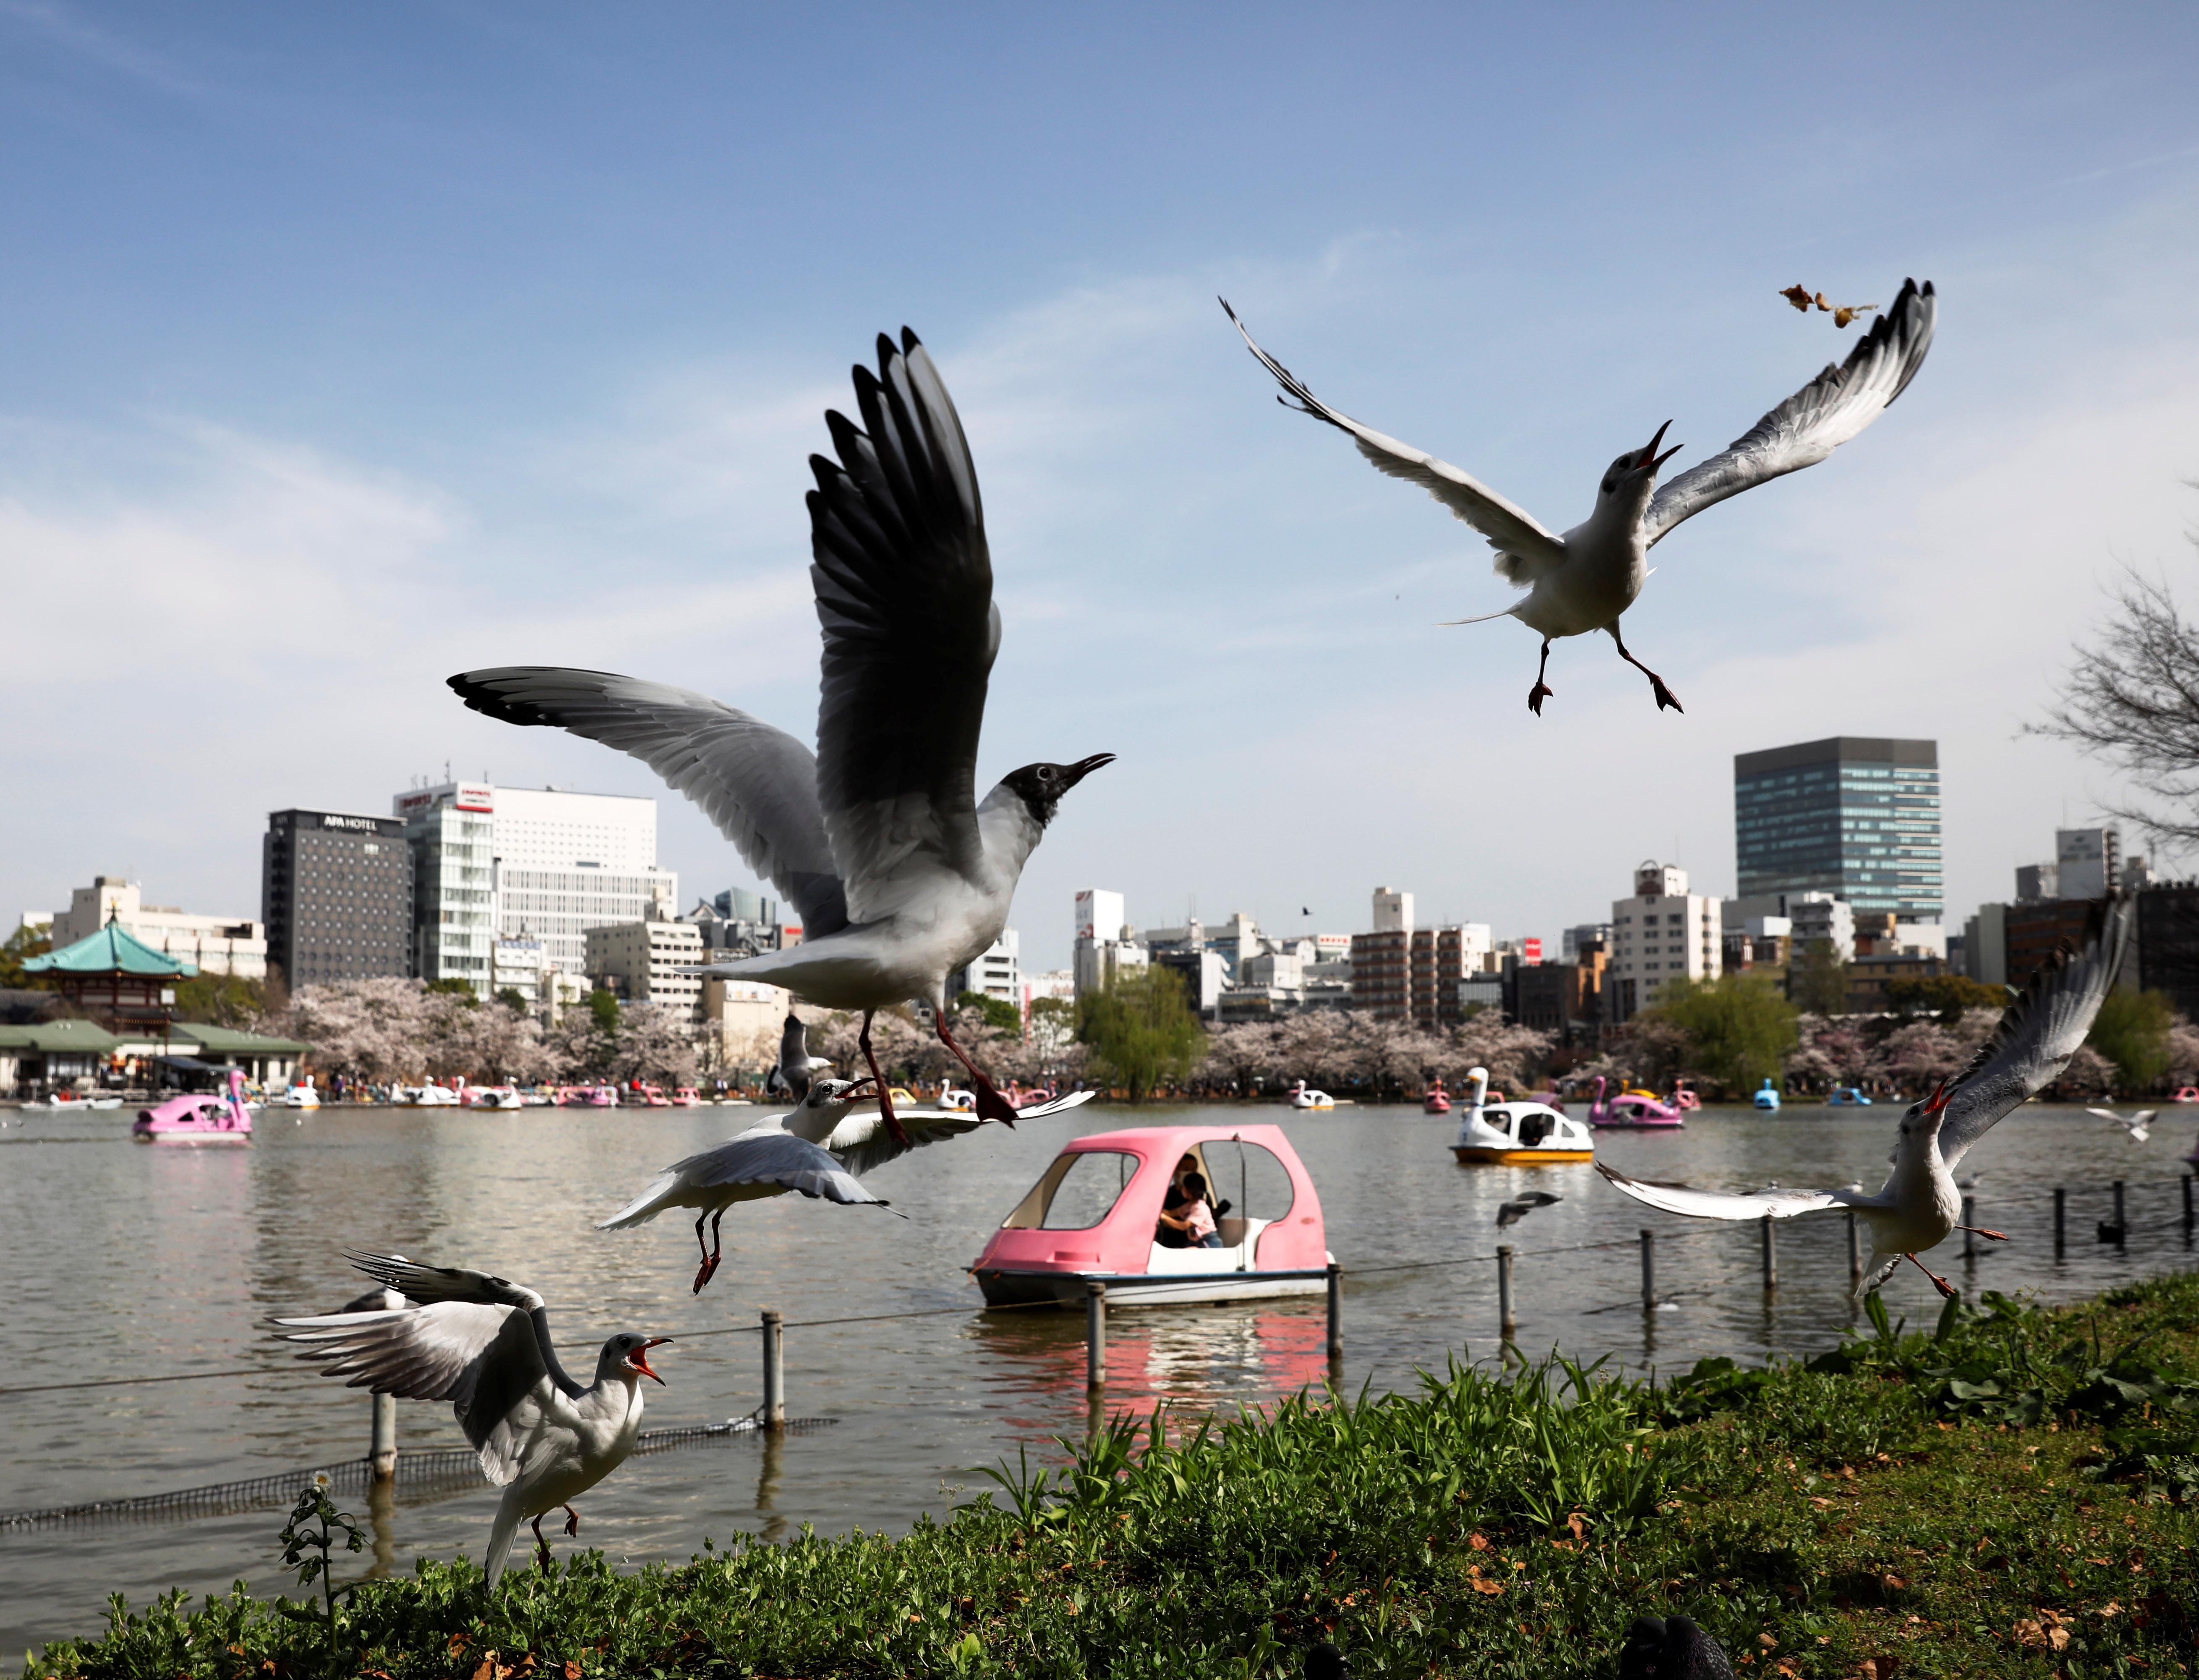 Seagulls fly near Shinobazu Pond in Ueno Park in Tokyo, Japan, March 29, 2021. REUTERS/Kim Kyung-Hoon